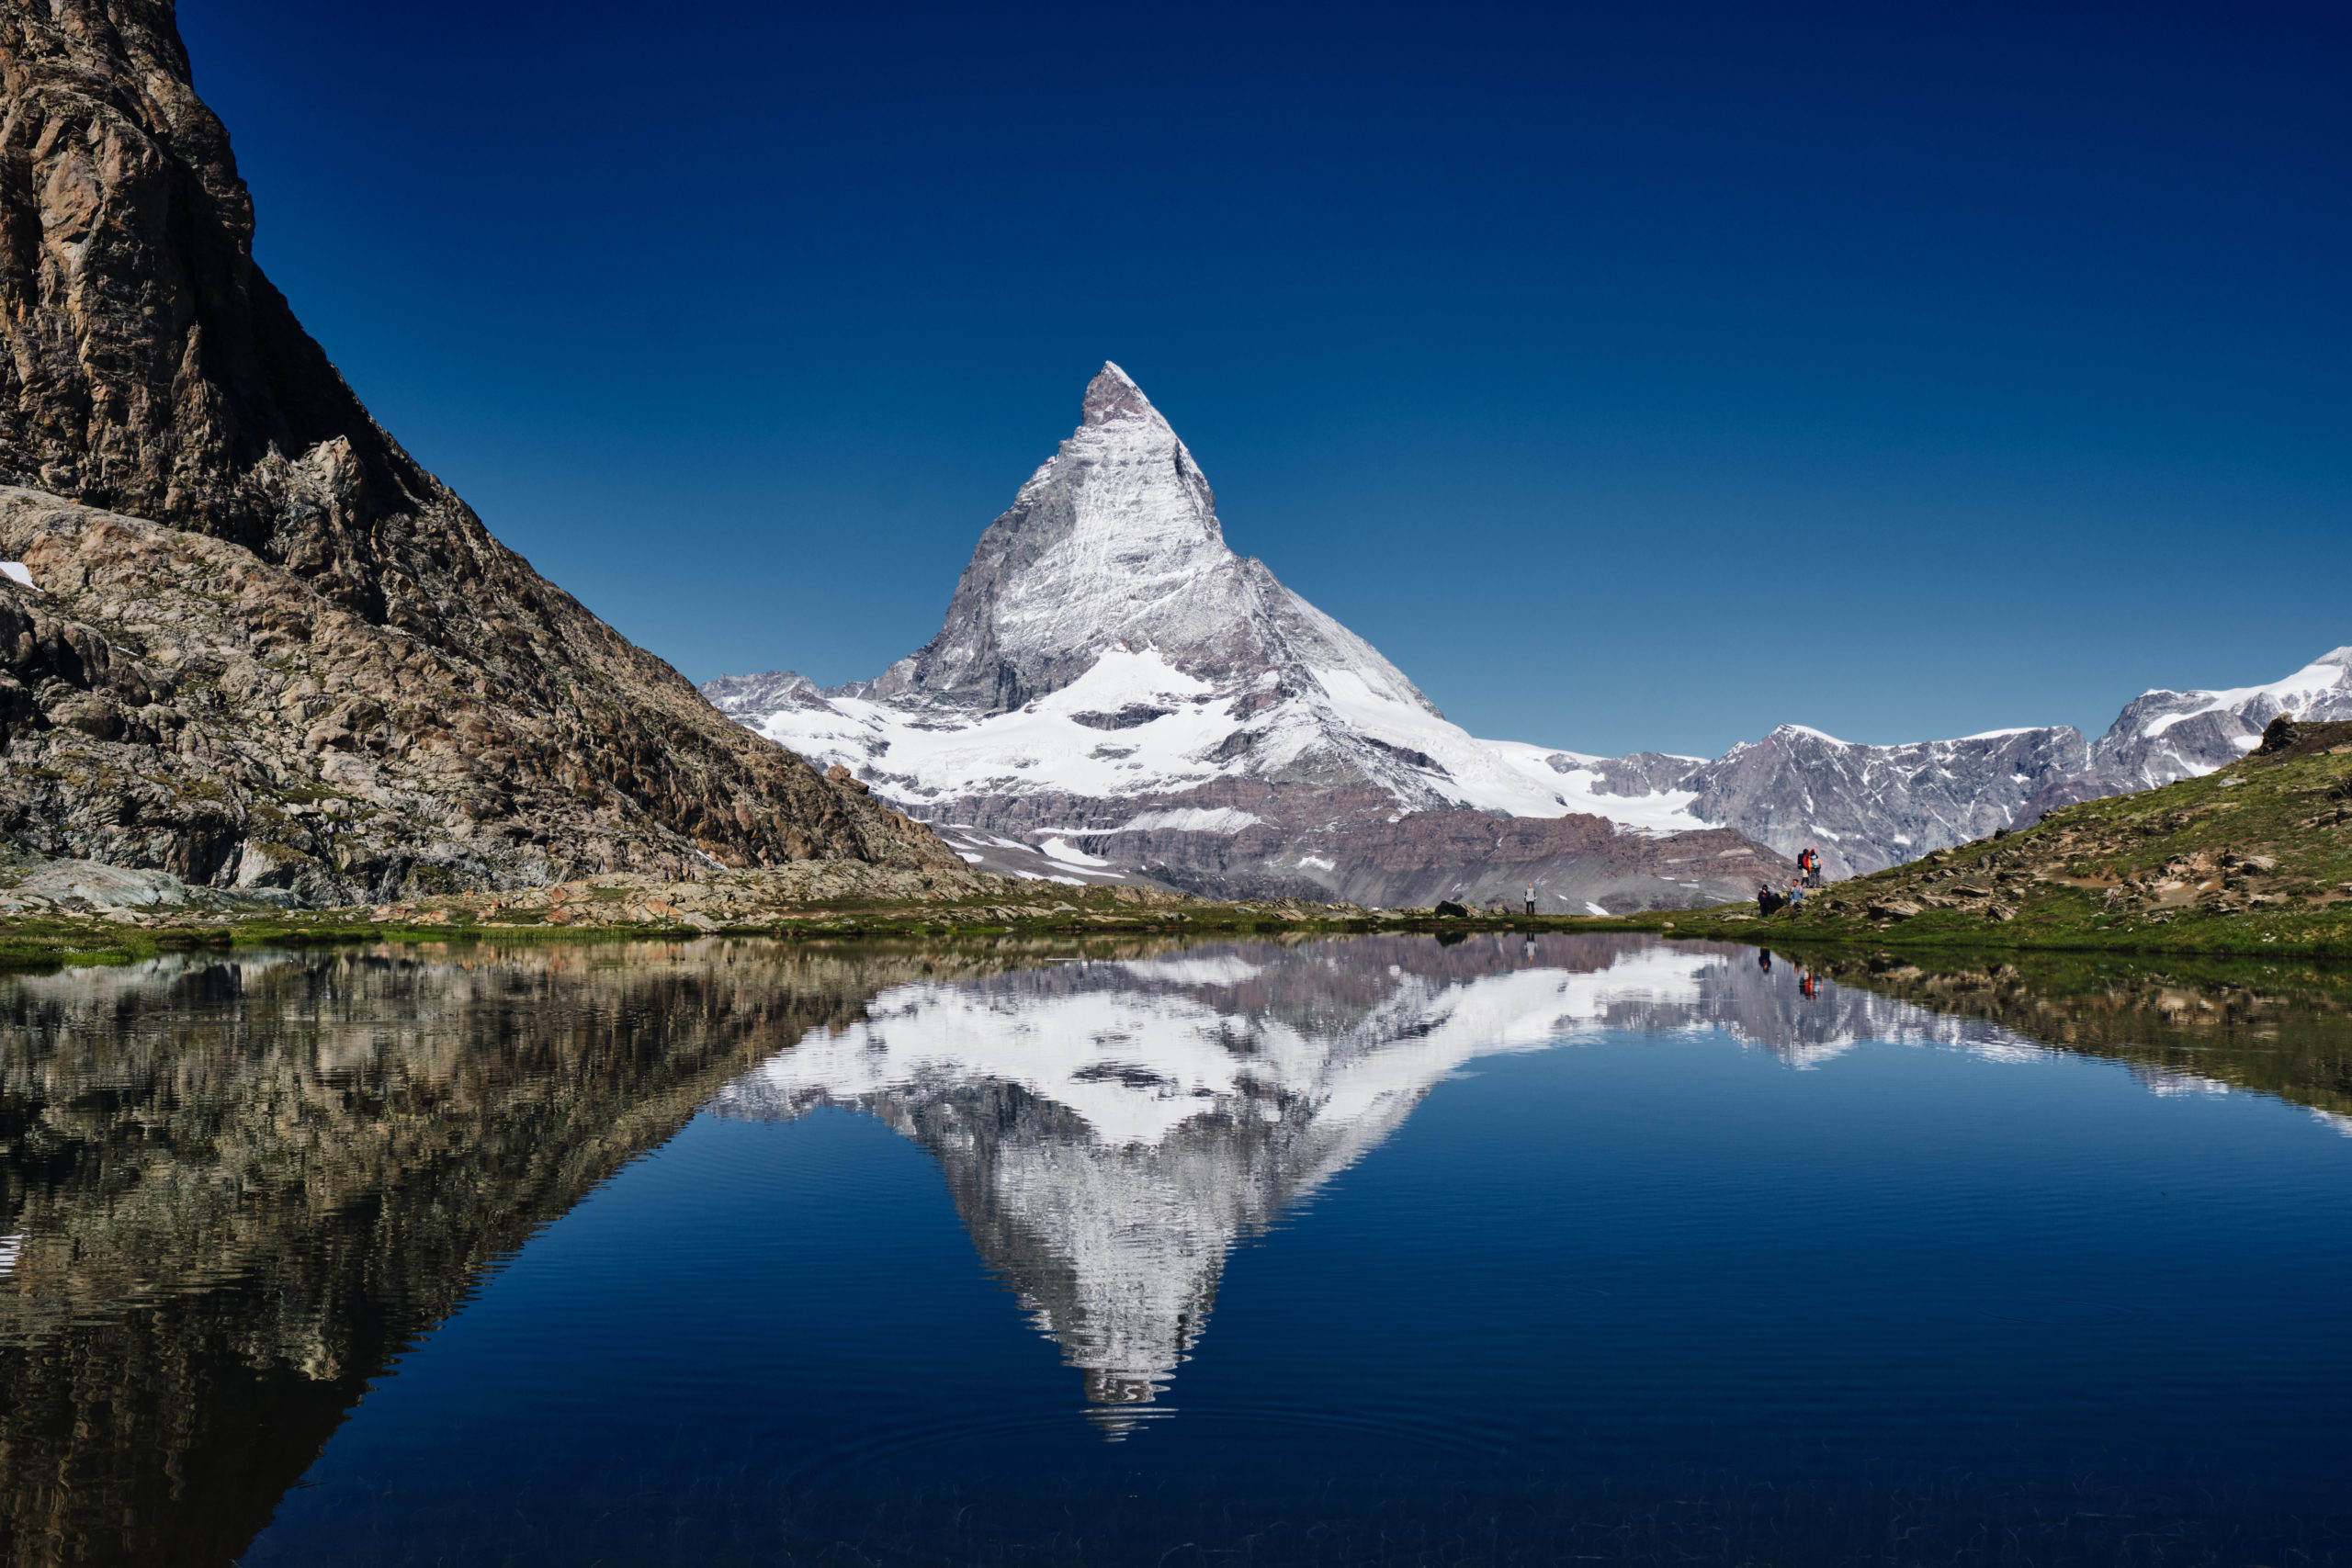 Matterhorn and reflection at Switzerland